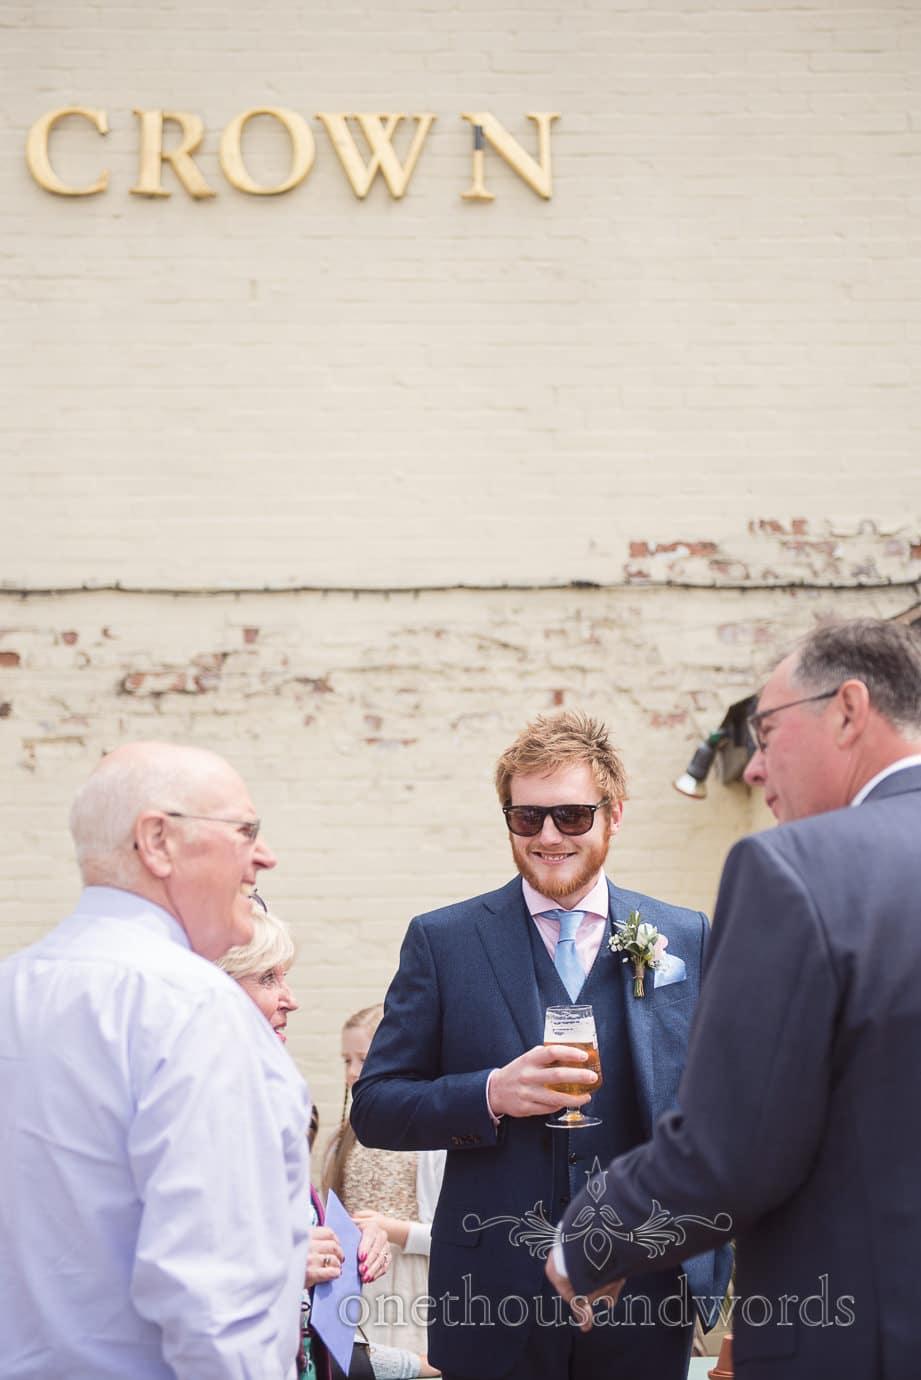 Groom in Blue suit drinks a beer on wedding morning at Crown Pub